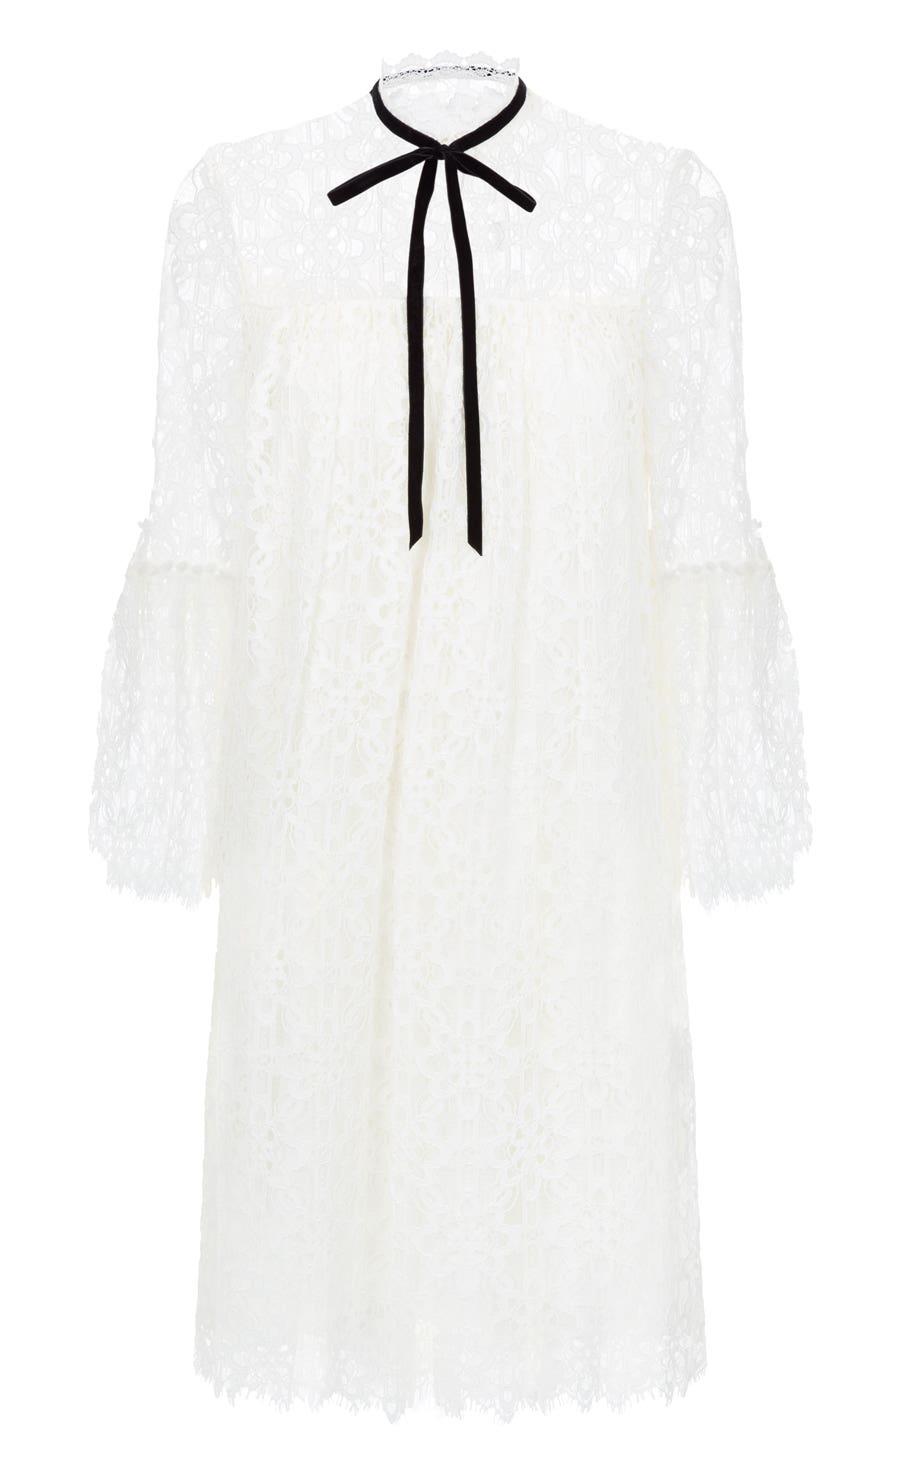 Eclipse Lace Mini Dress, White